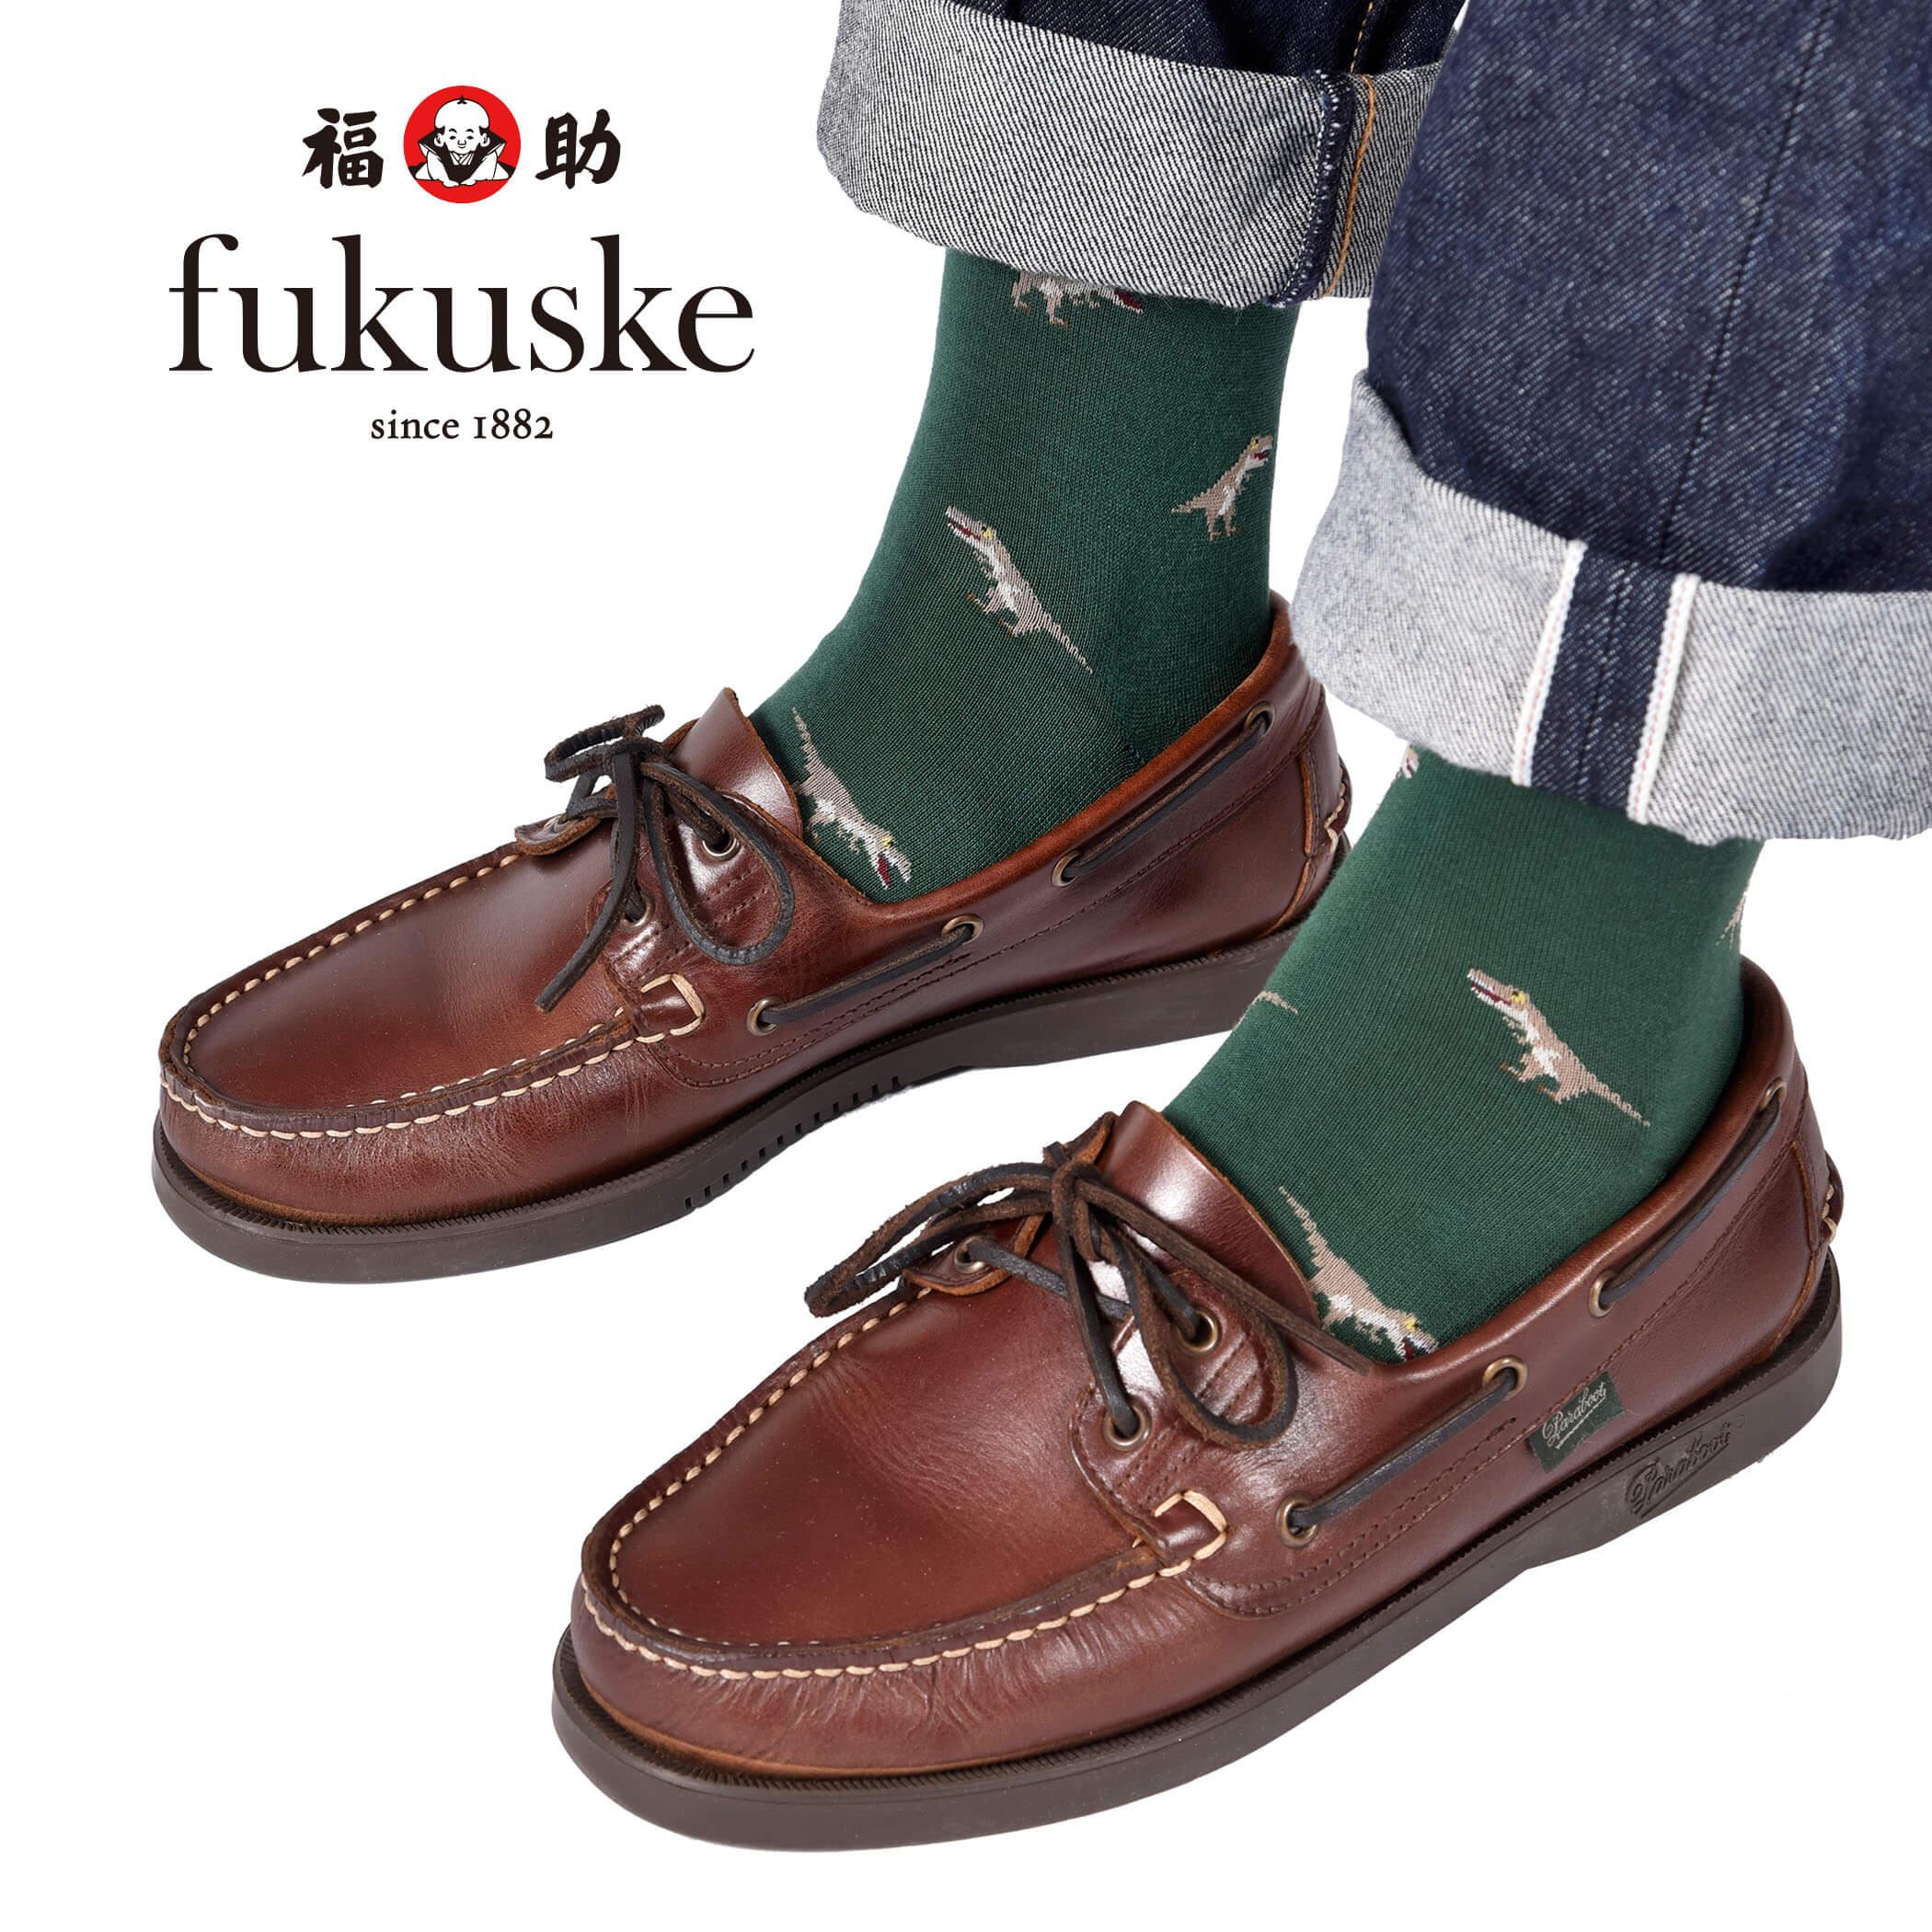 fukuske T-REX柄 クルー丈 ソックス